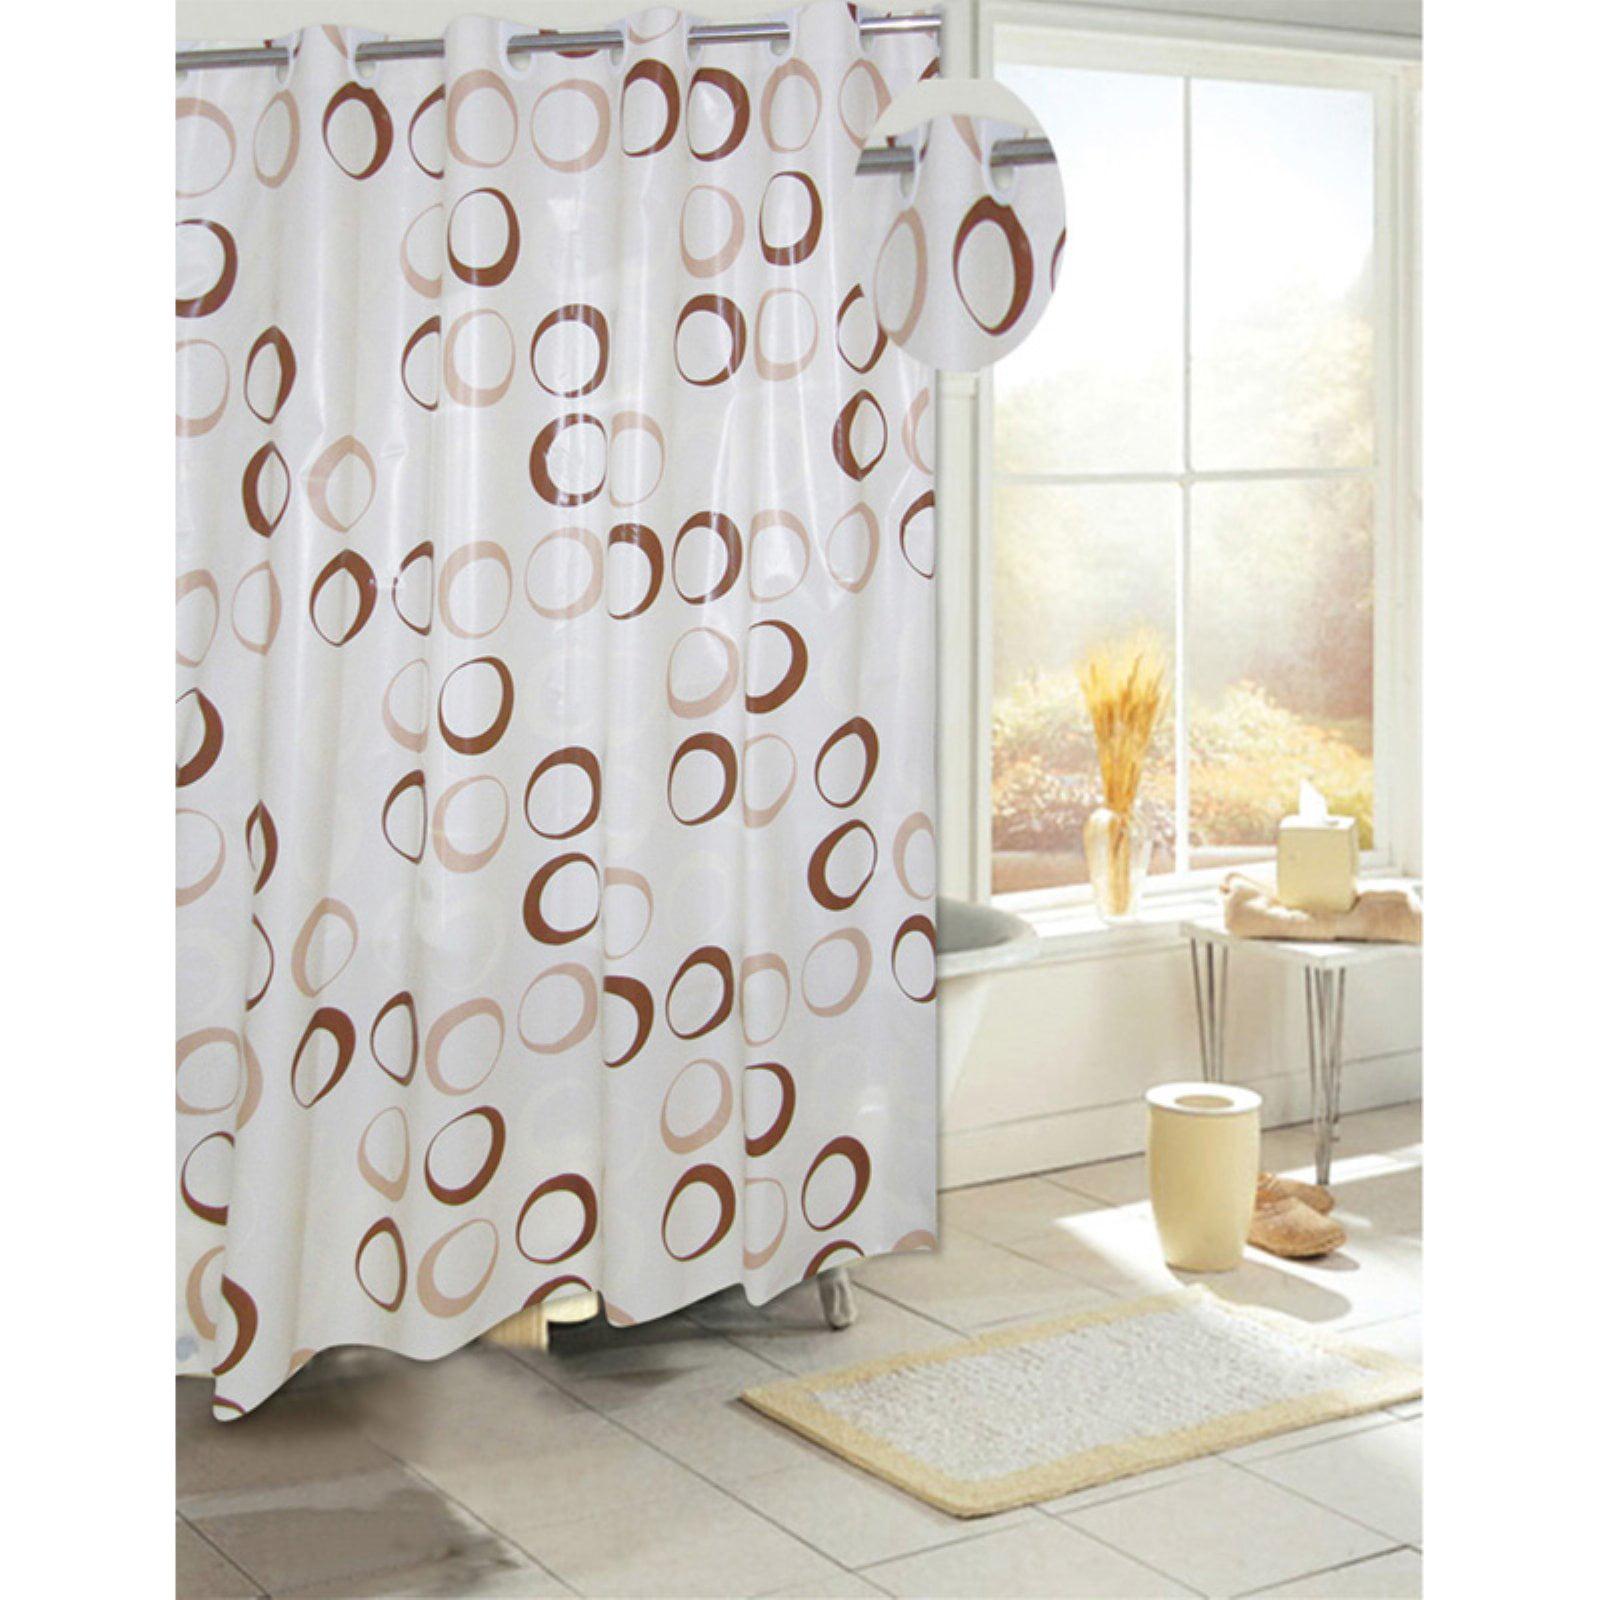 Shower Curtain Hooks Gray Home Furniture Diy Carnation